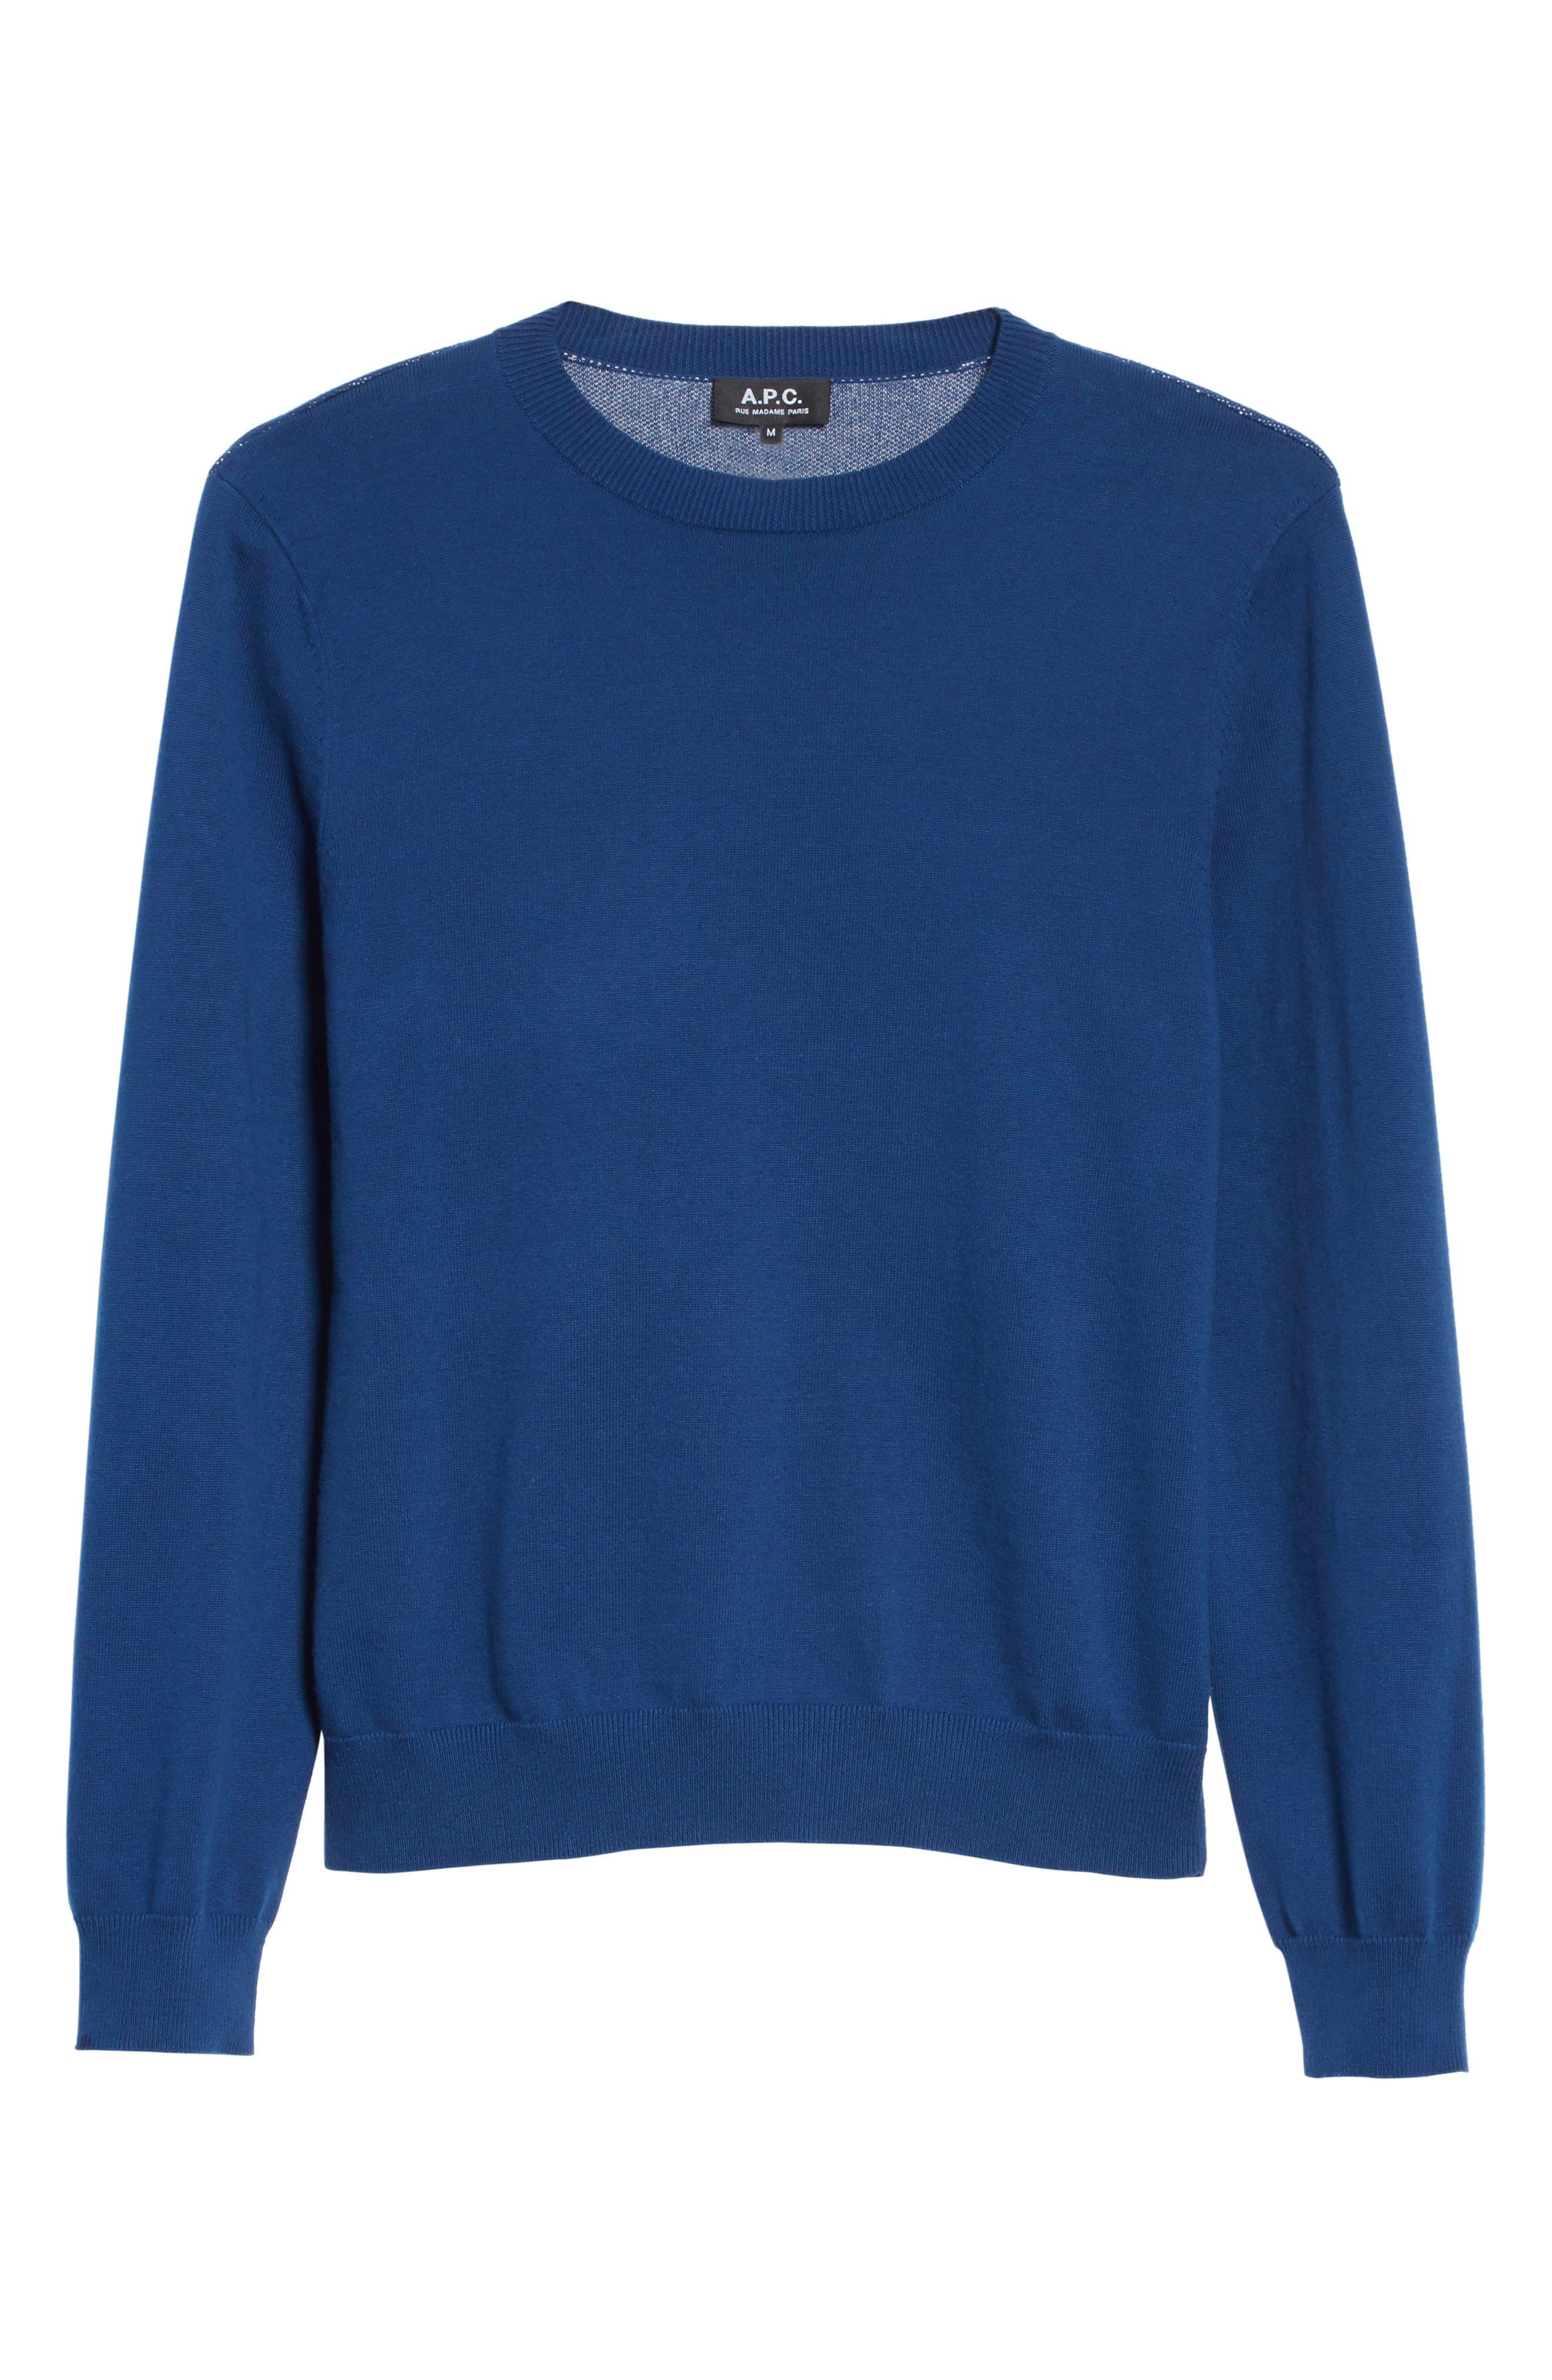 CIA Crewneck Sweater,                             Alternate thumbnail 6, color,                             401